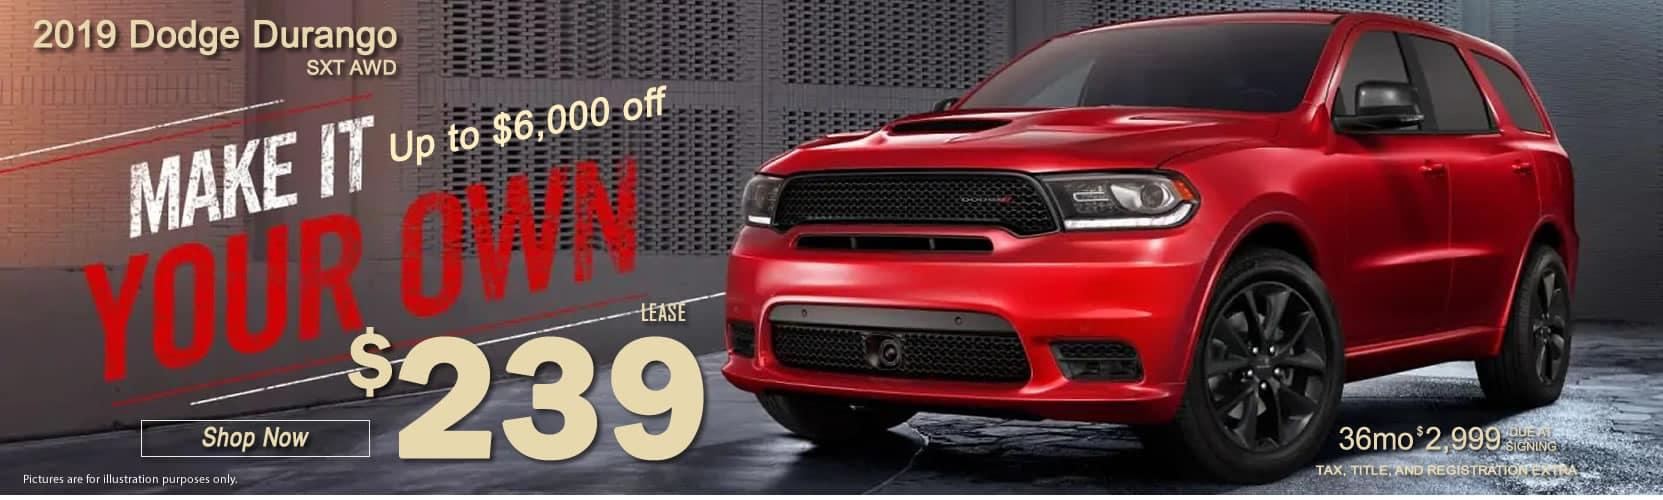 2019-Dodge-Durango SXT-AWD